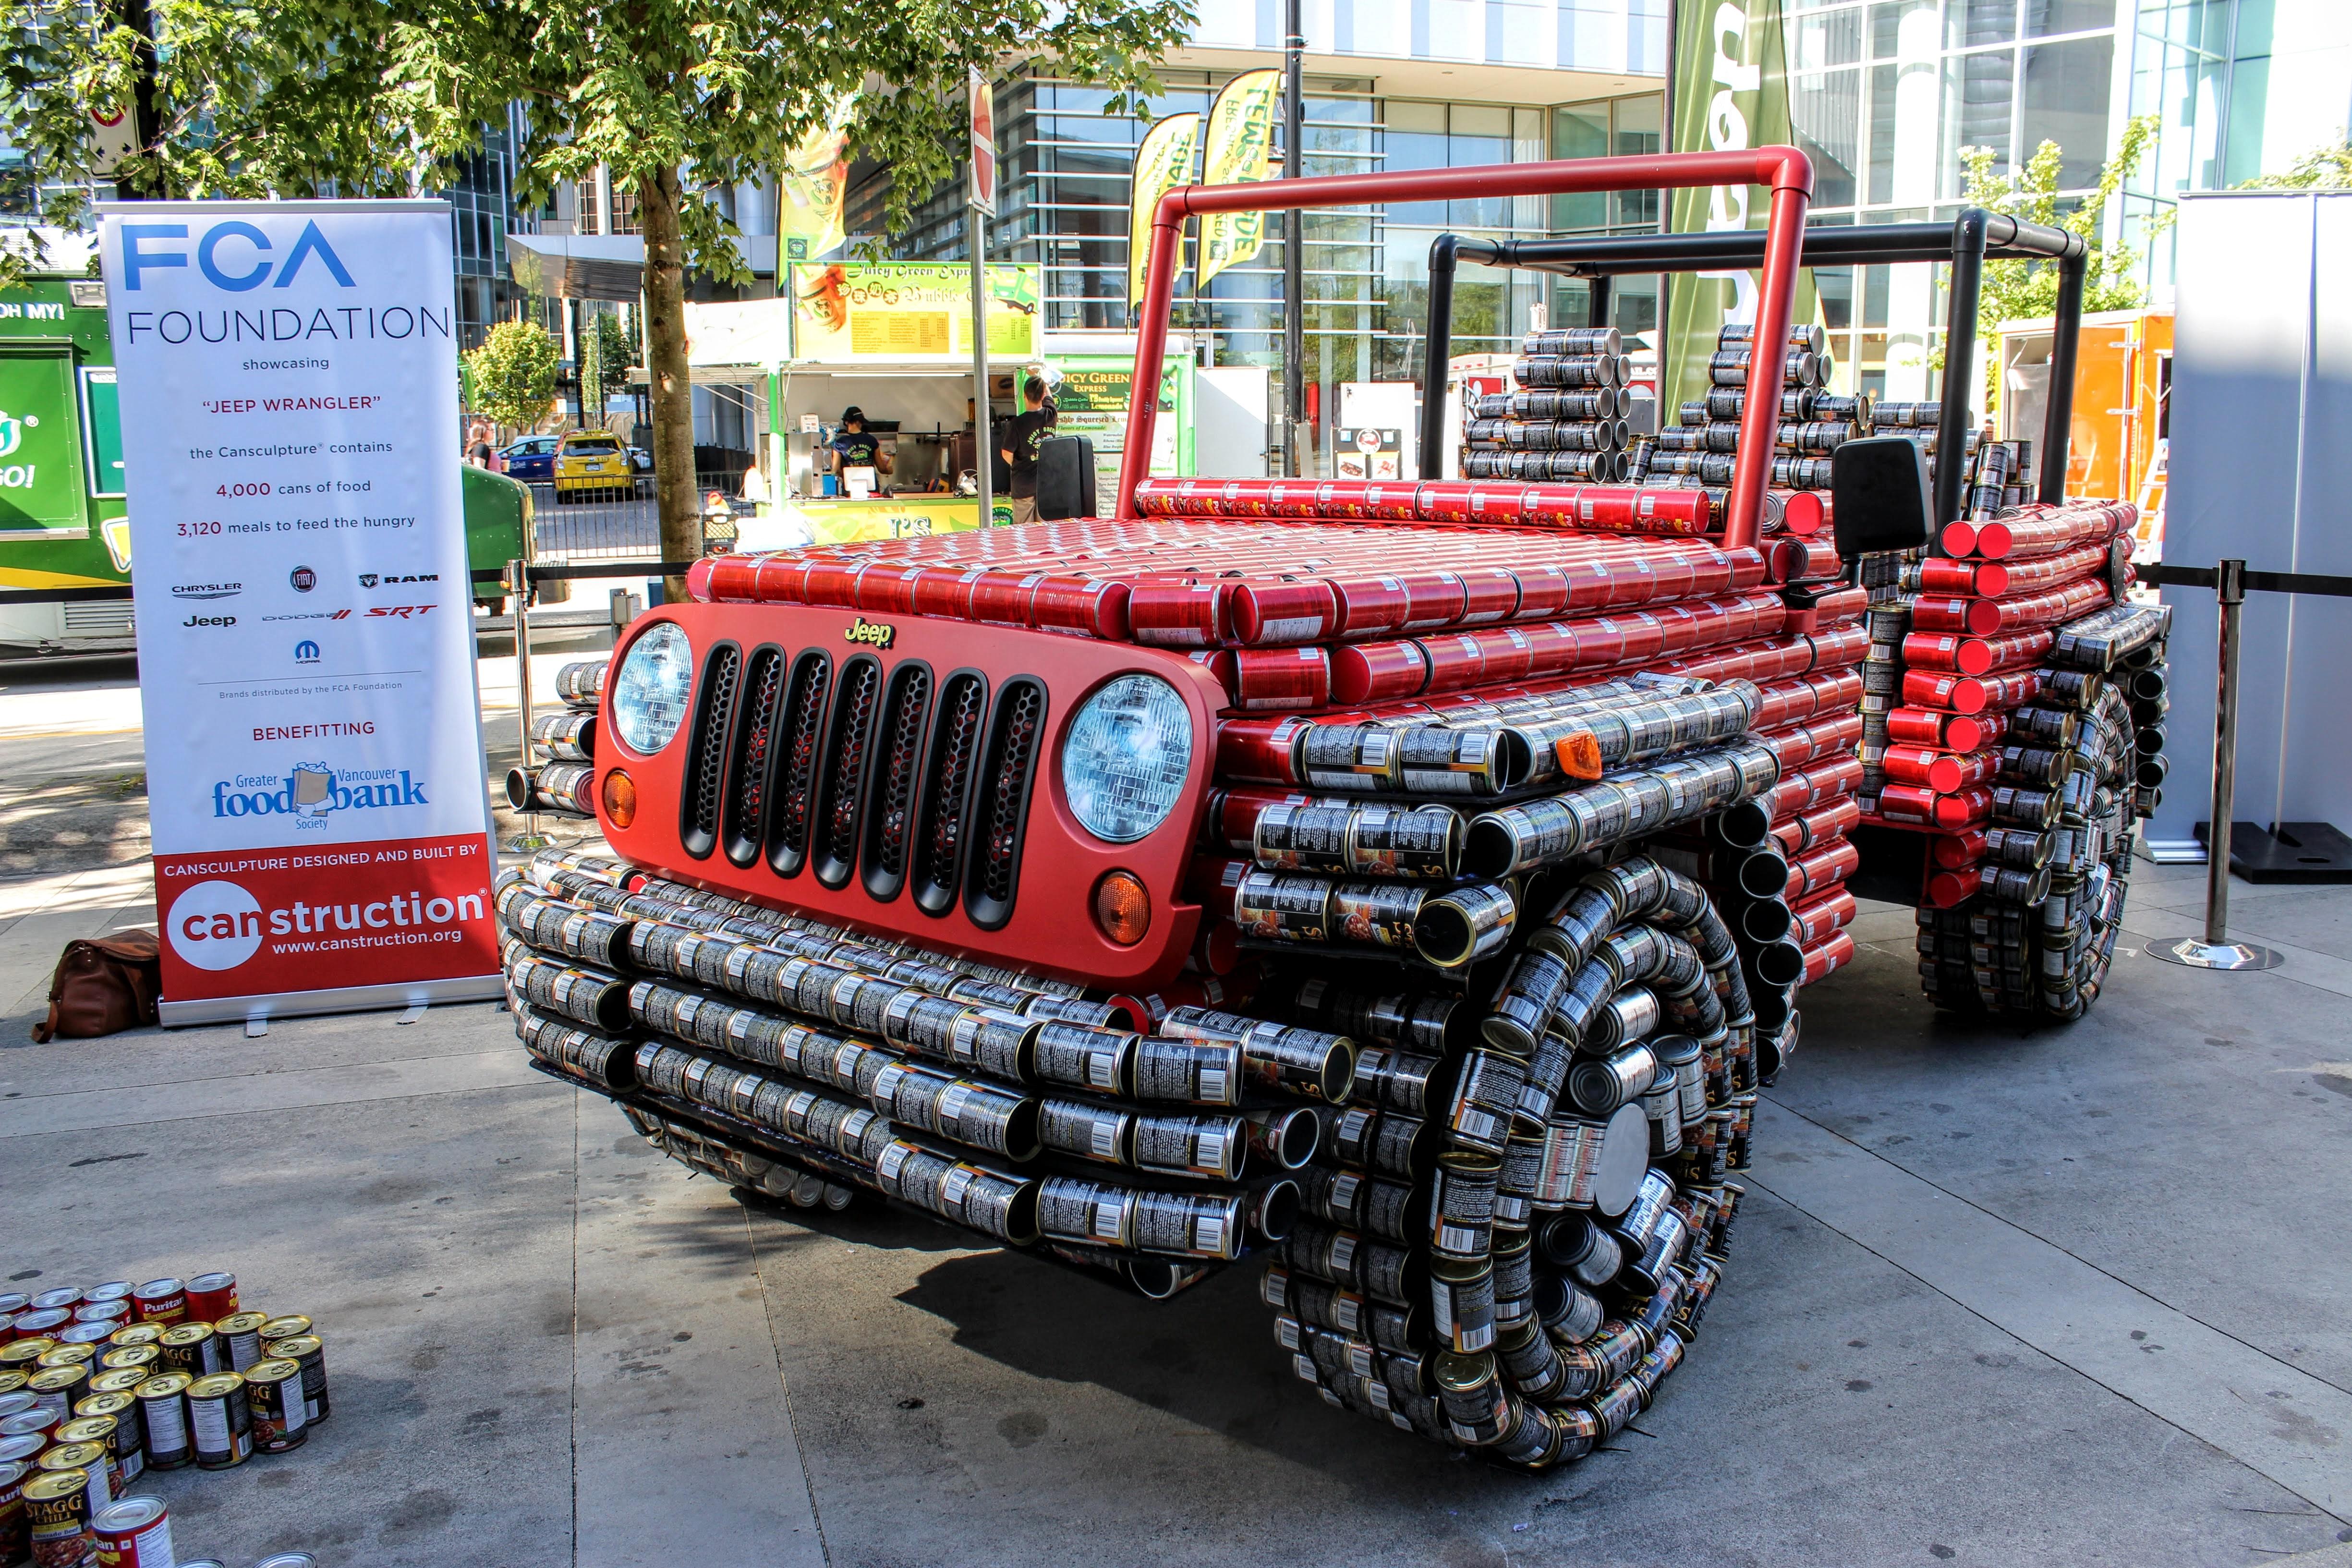 Jeep_Canstruction4hhg0pdih4bi54pesa5hulrg6kg